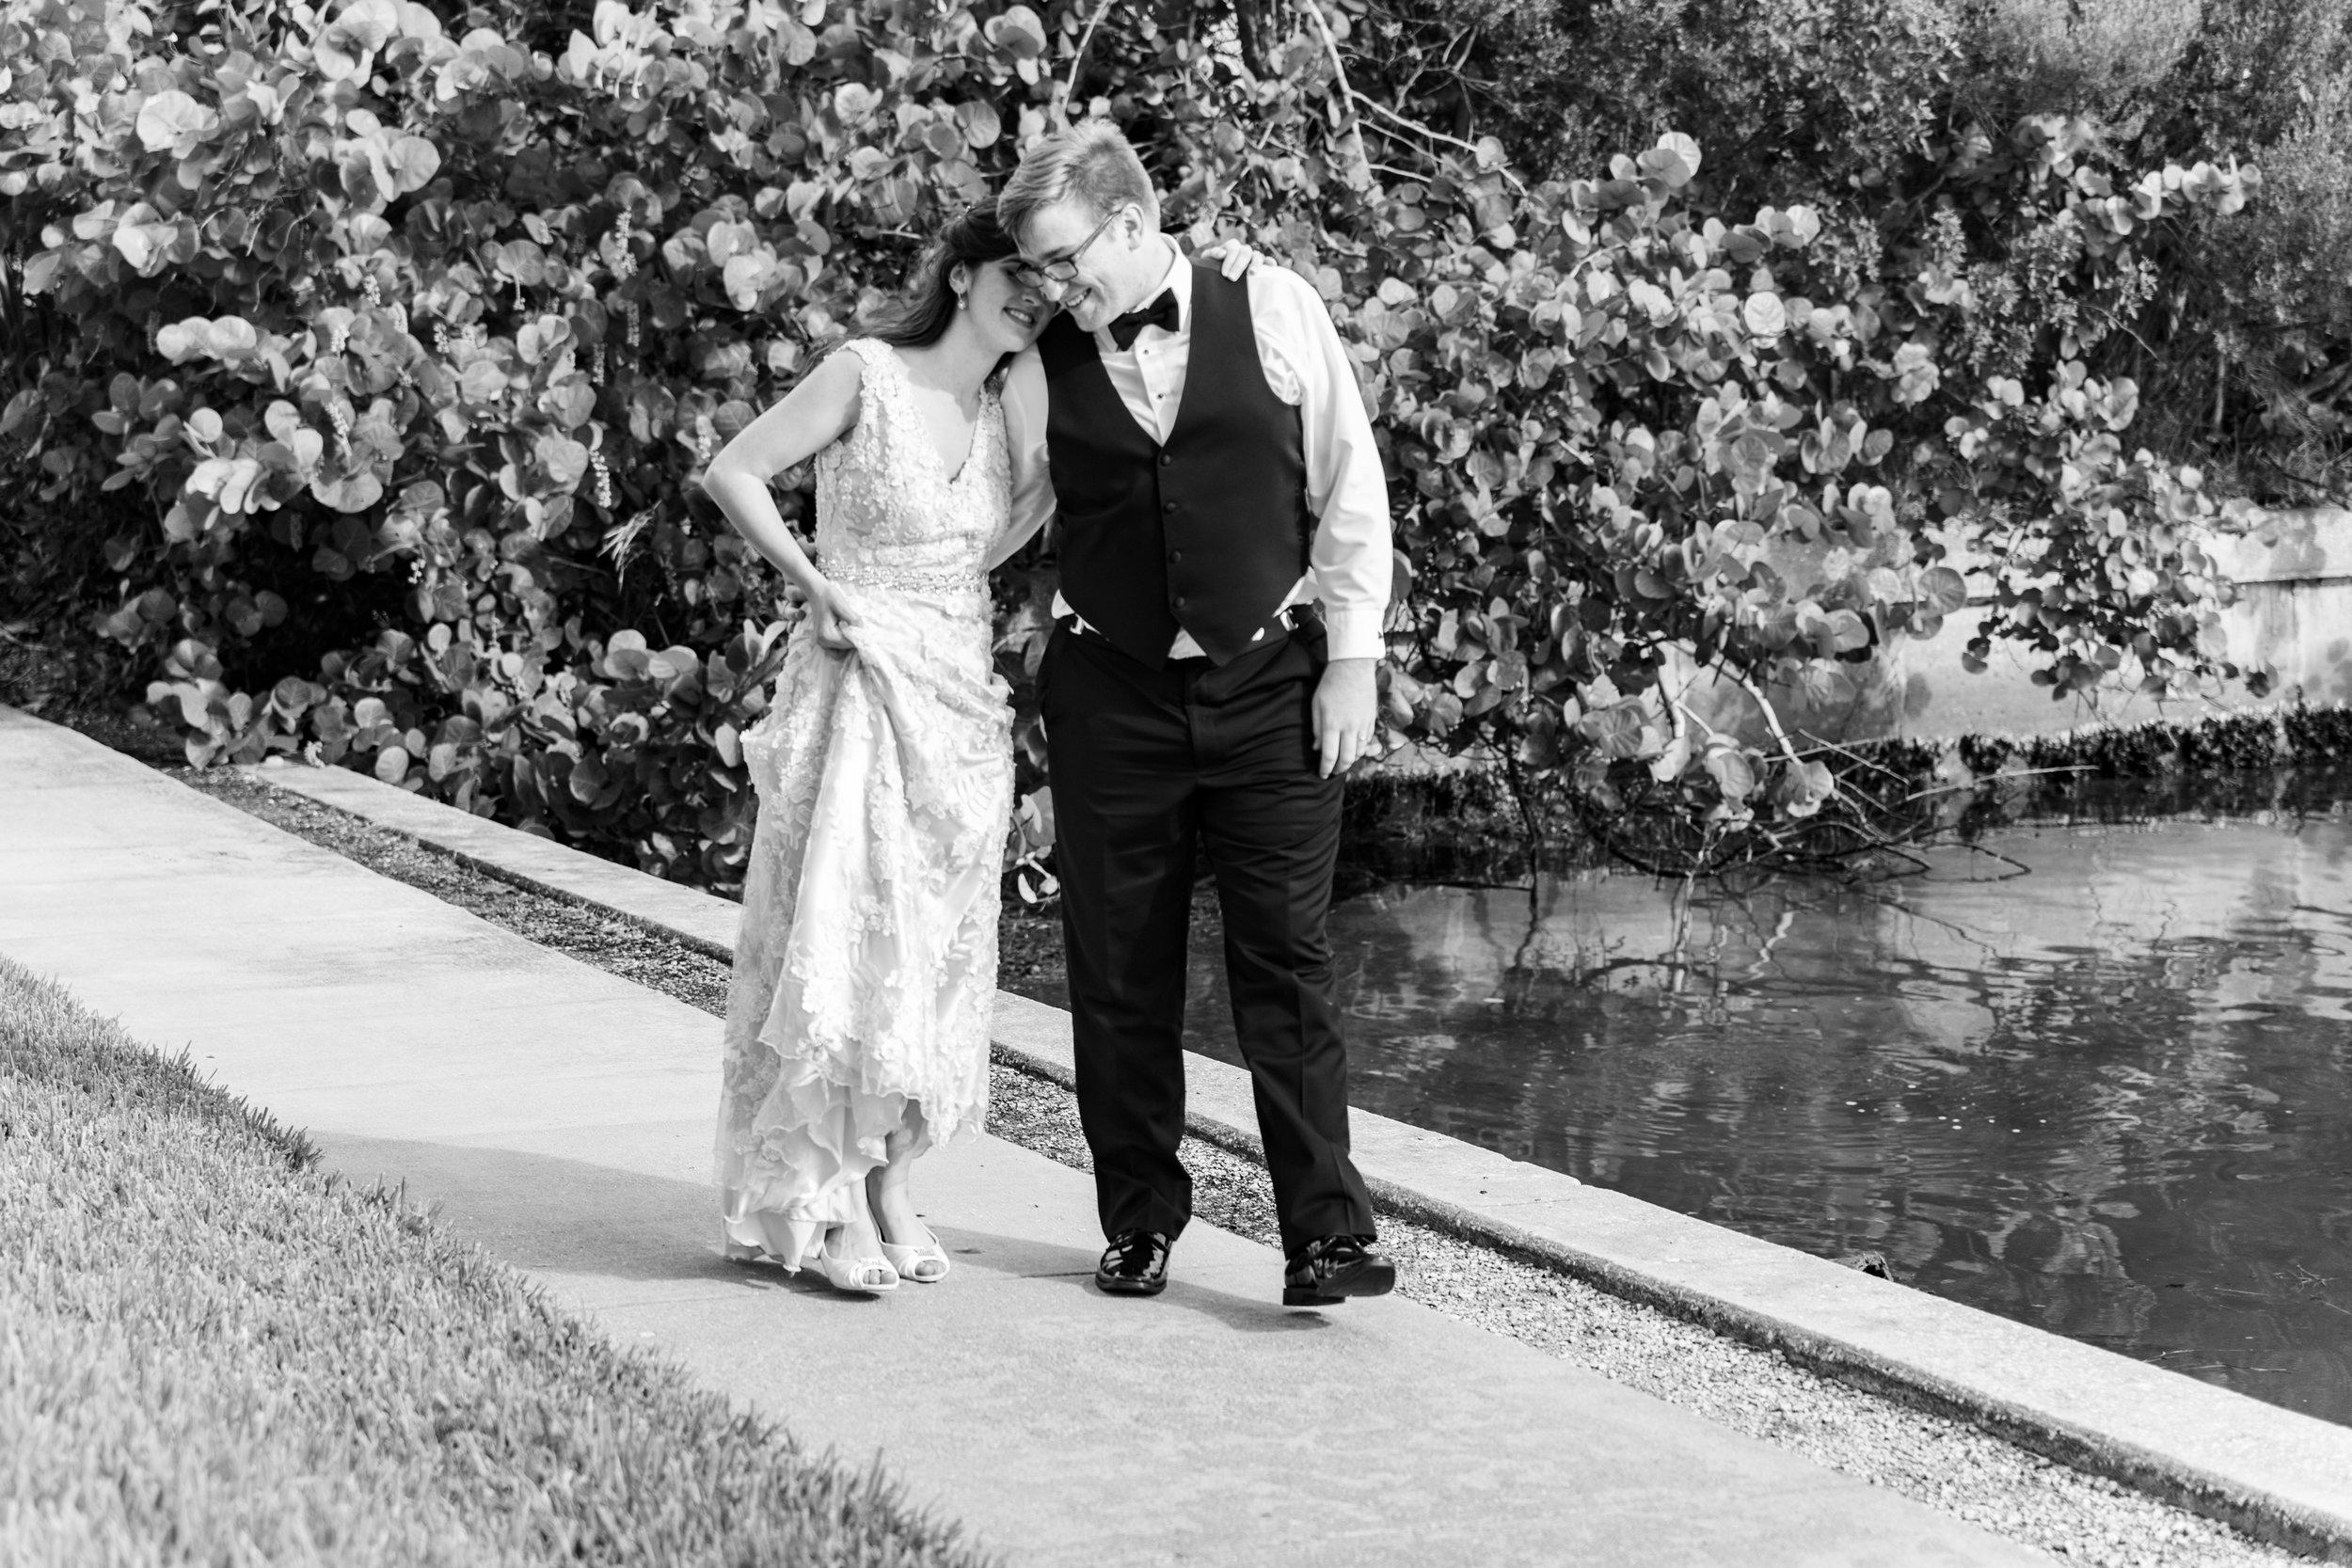 HAH_Zoe and Daniel_Clearwater Wedding_618_2018.jpg